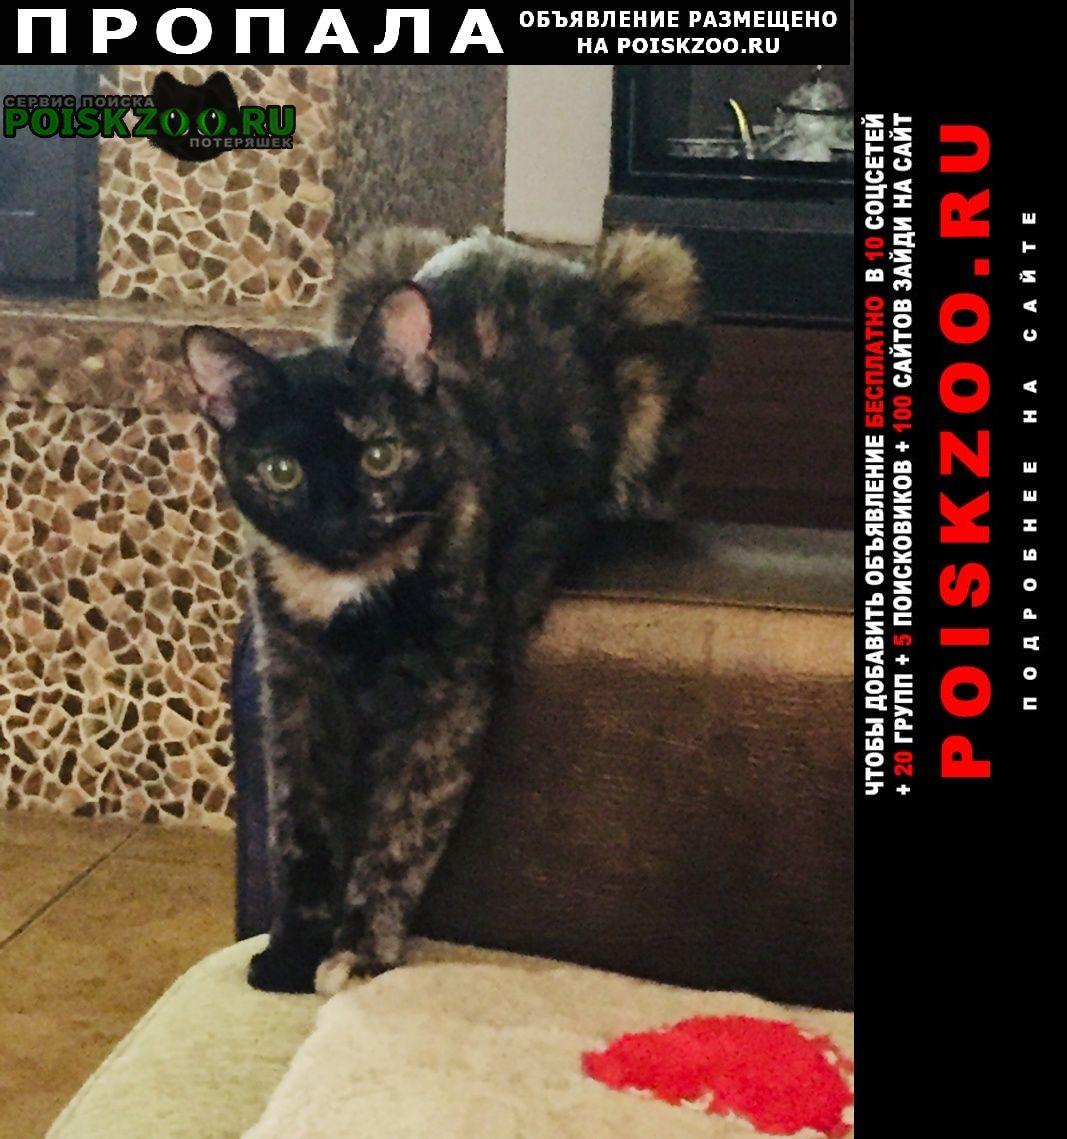 Пропала кошка Сыктывкар